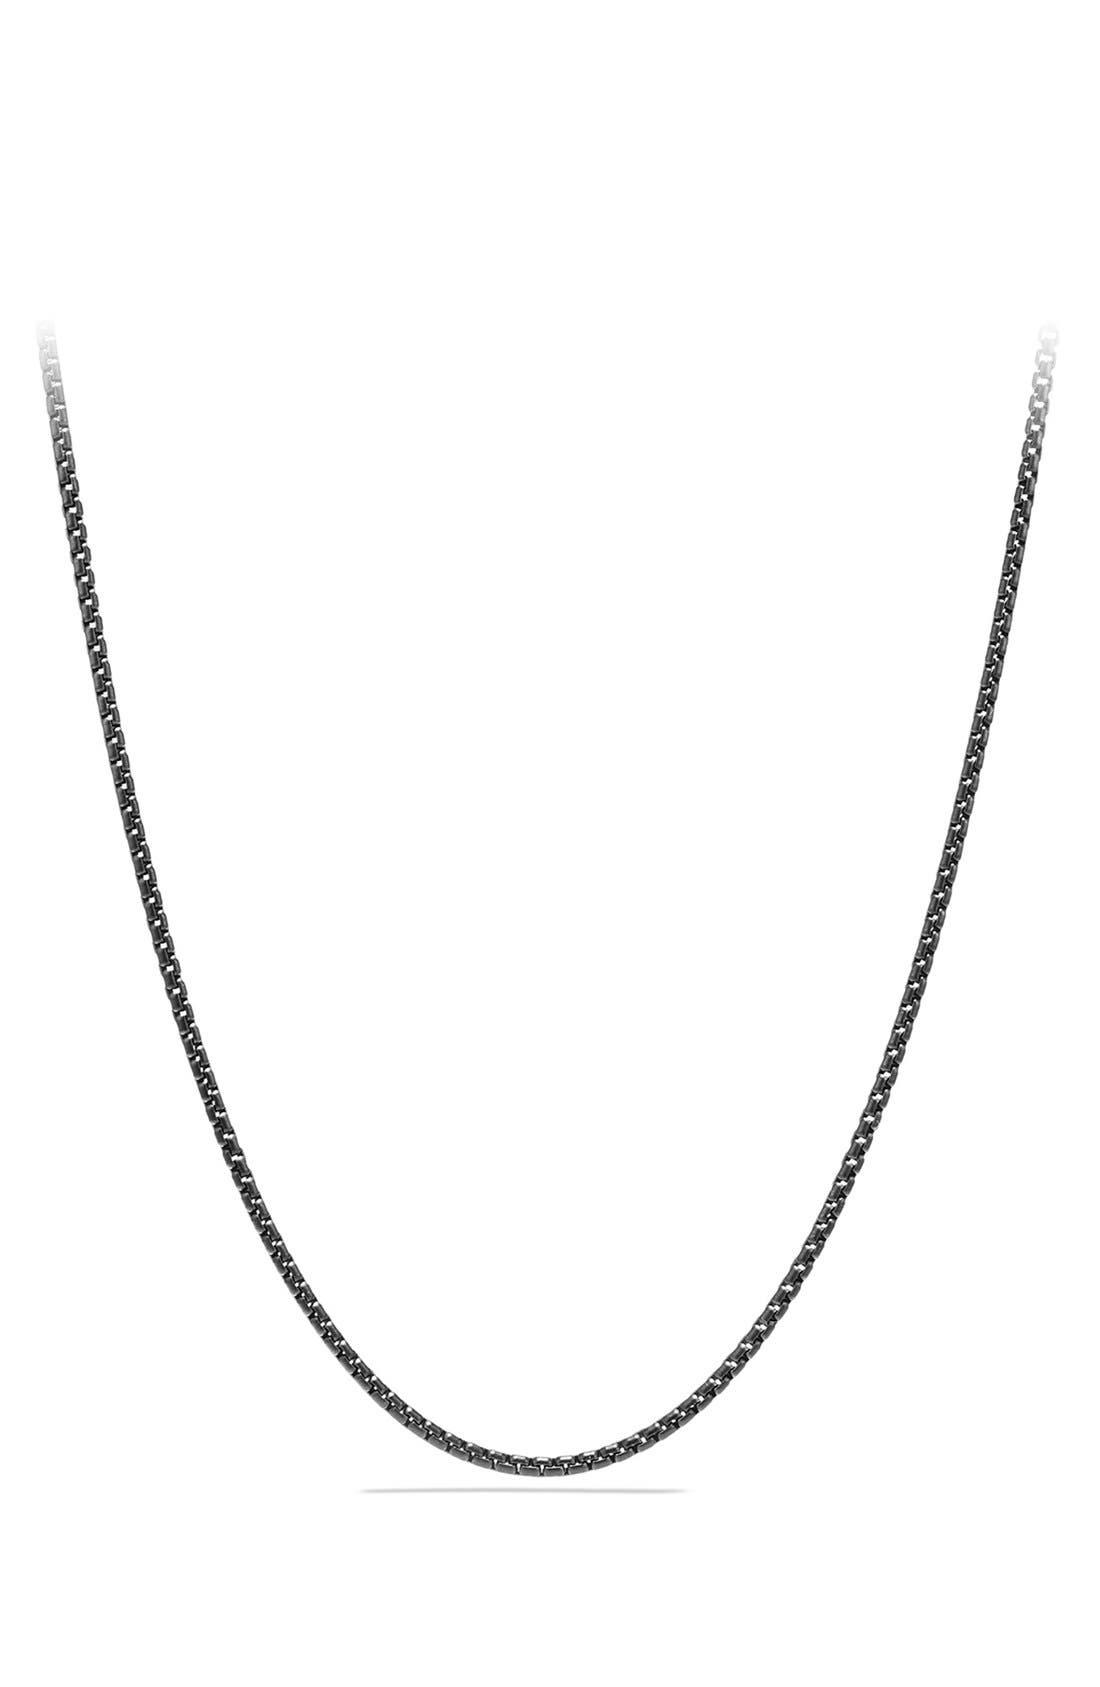 Alternate Image 1 Selected - David Yurman Small Black Box Chain